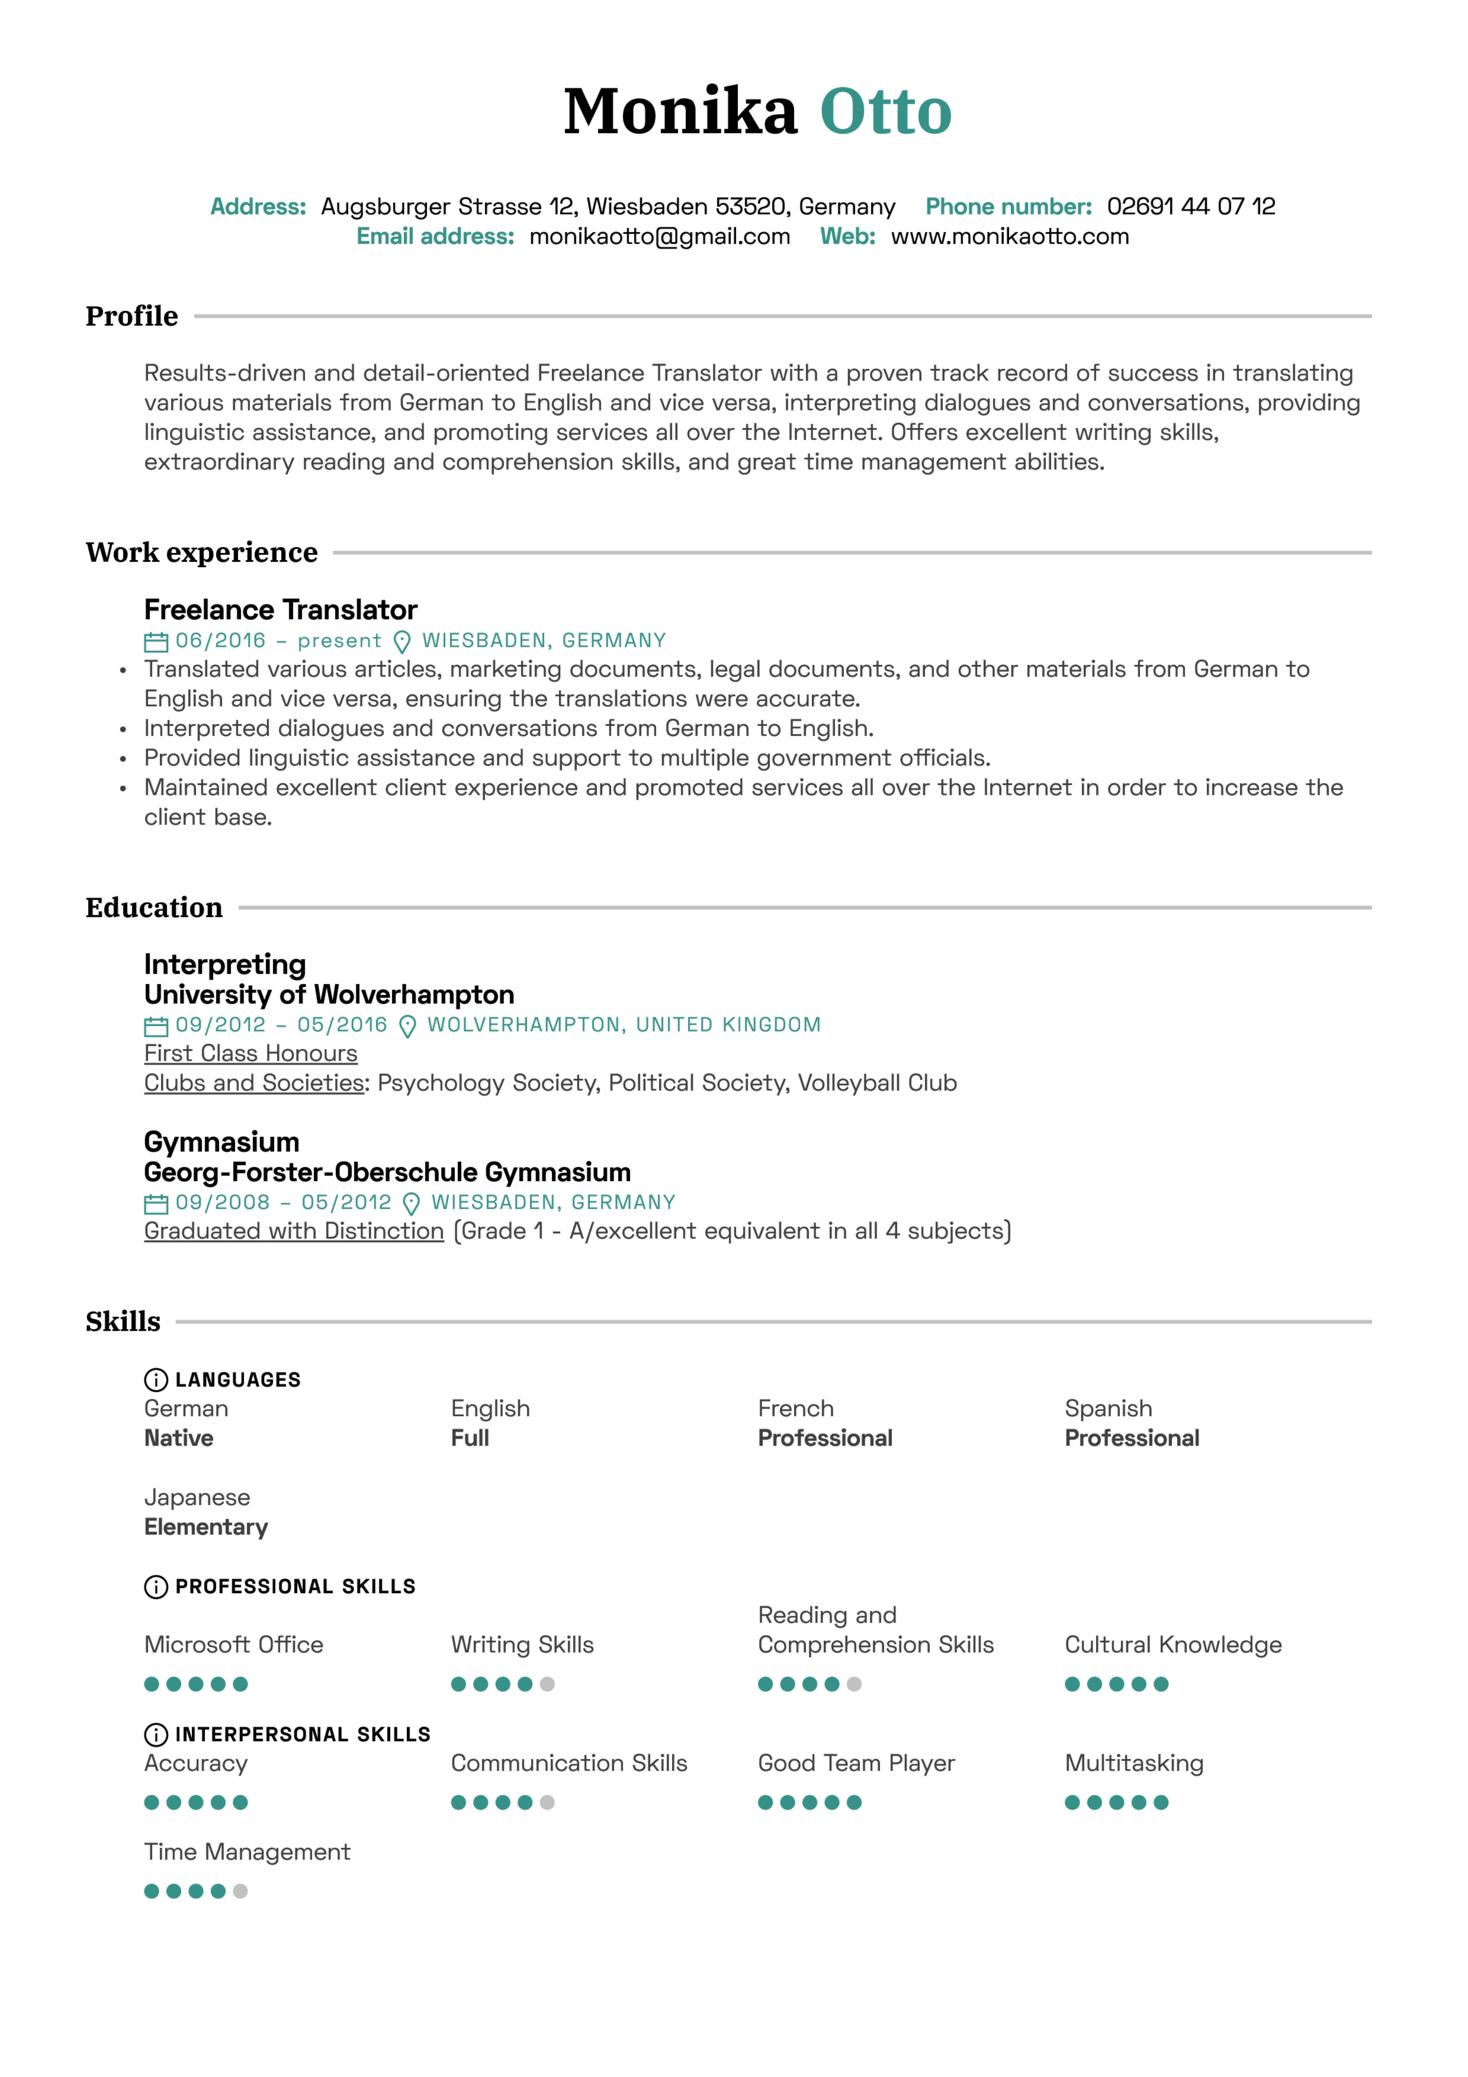 Translator Resume Sample (Part 1)